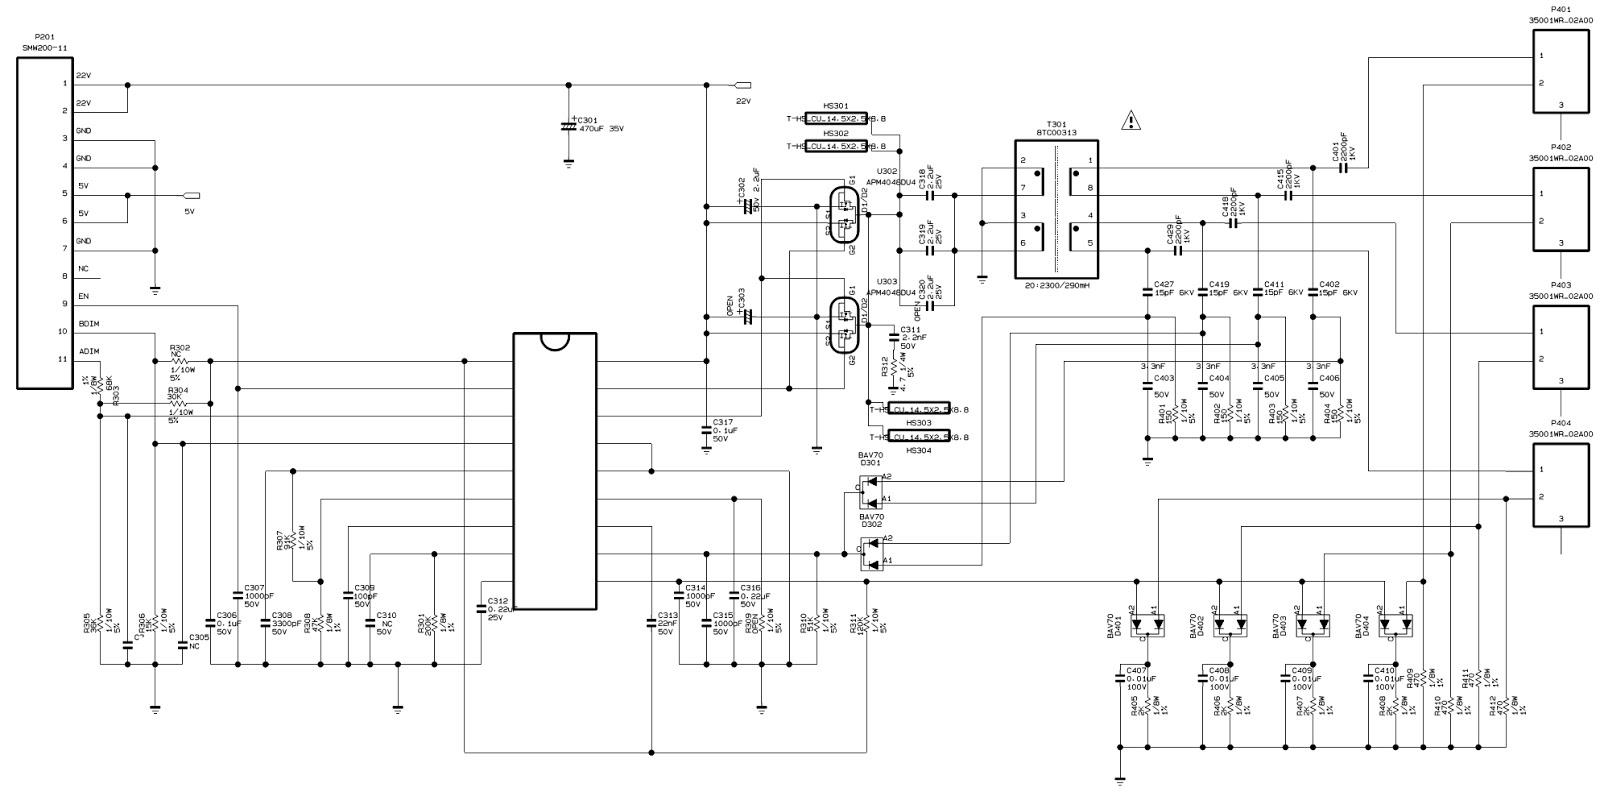 Electro Help  Lg Flatron W2243c - Troubleshooting